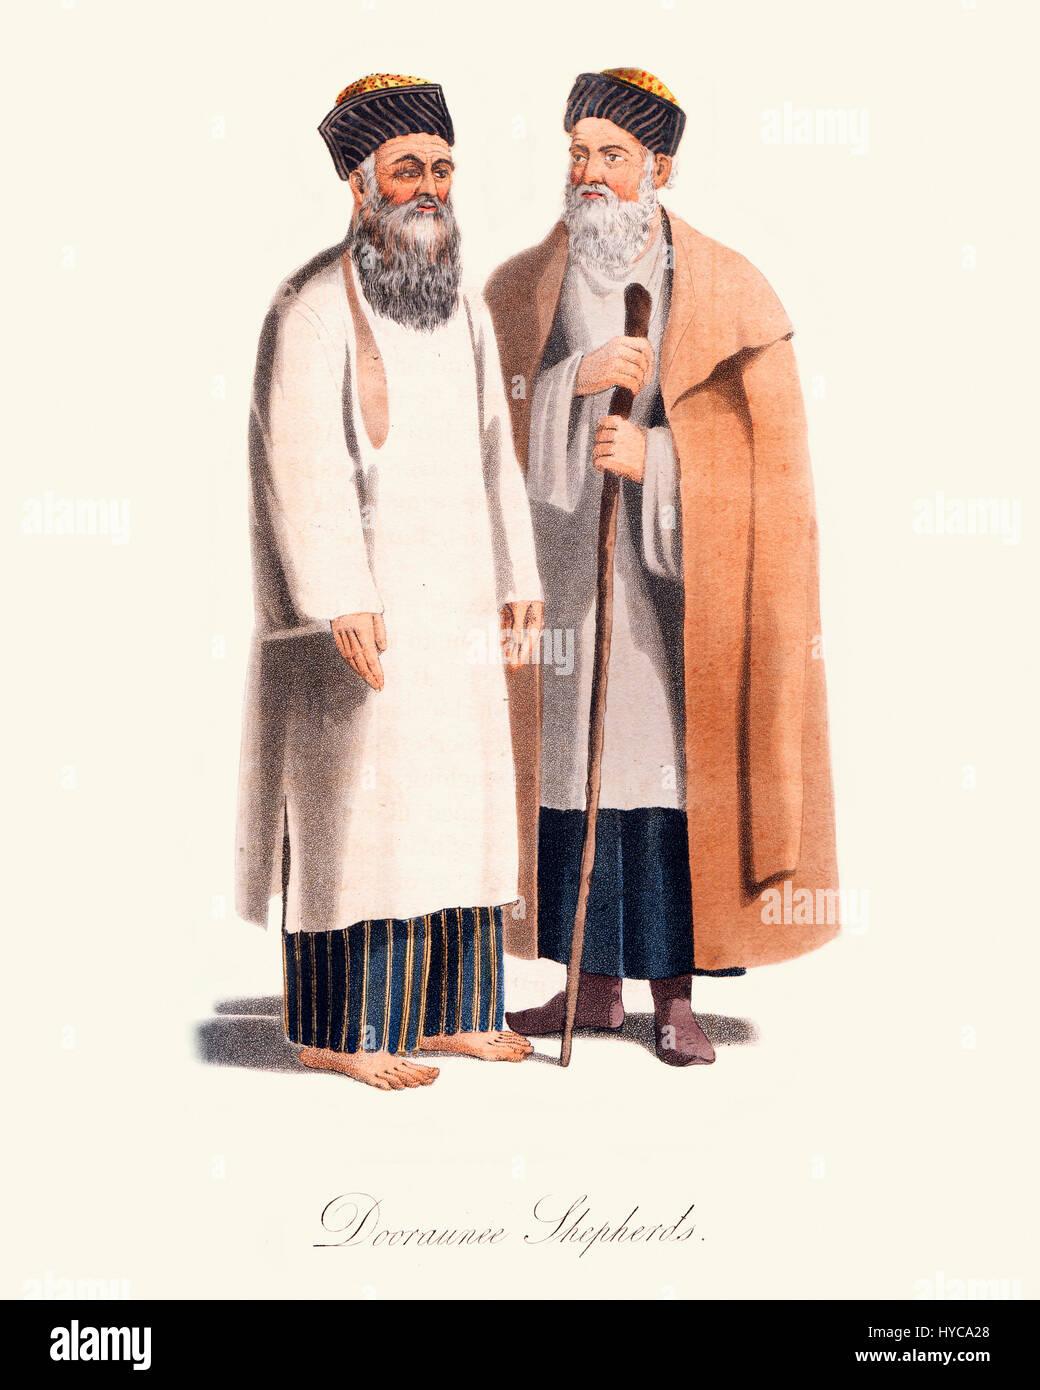 Afghan Shepherd: Afghan Men Turban Stock Photos & Afghan Men Turban Stock